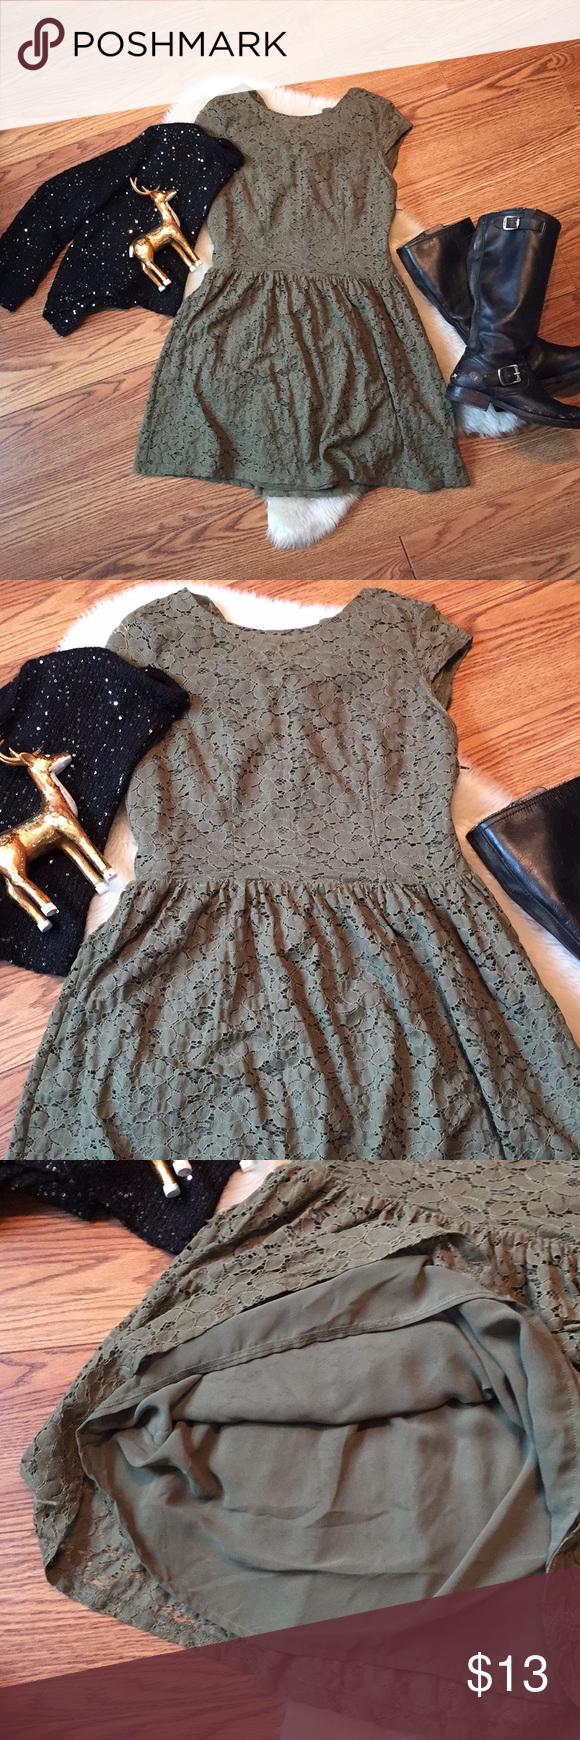 H&m green lace dress  Olive green HuM lace dress